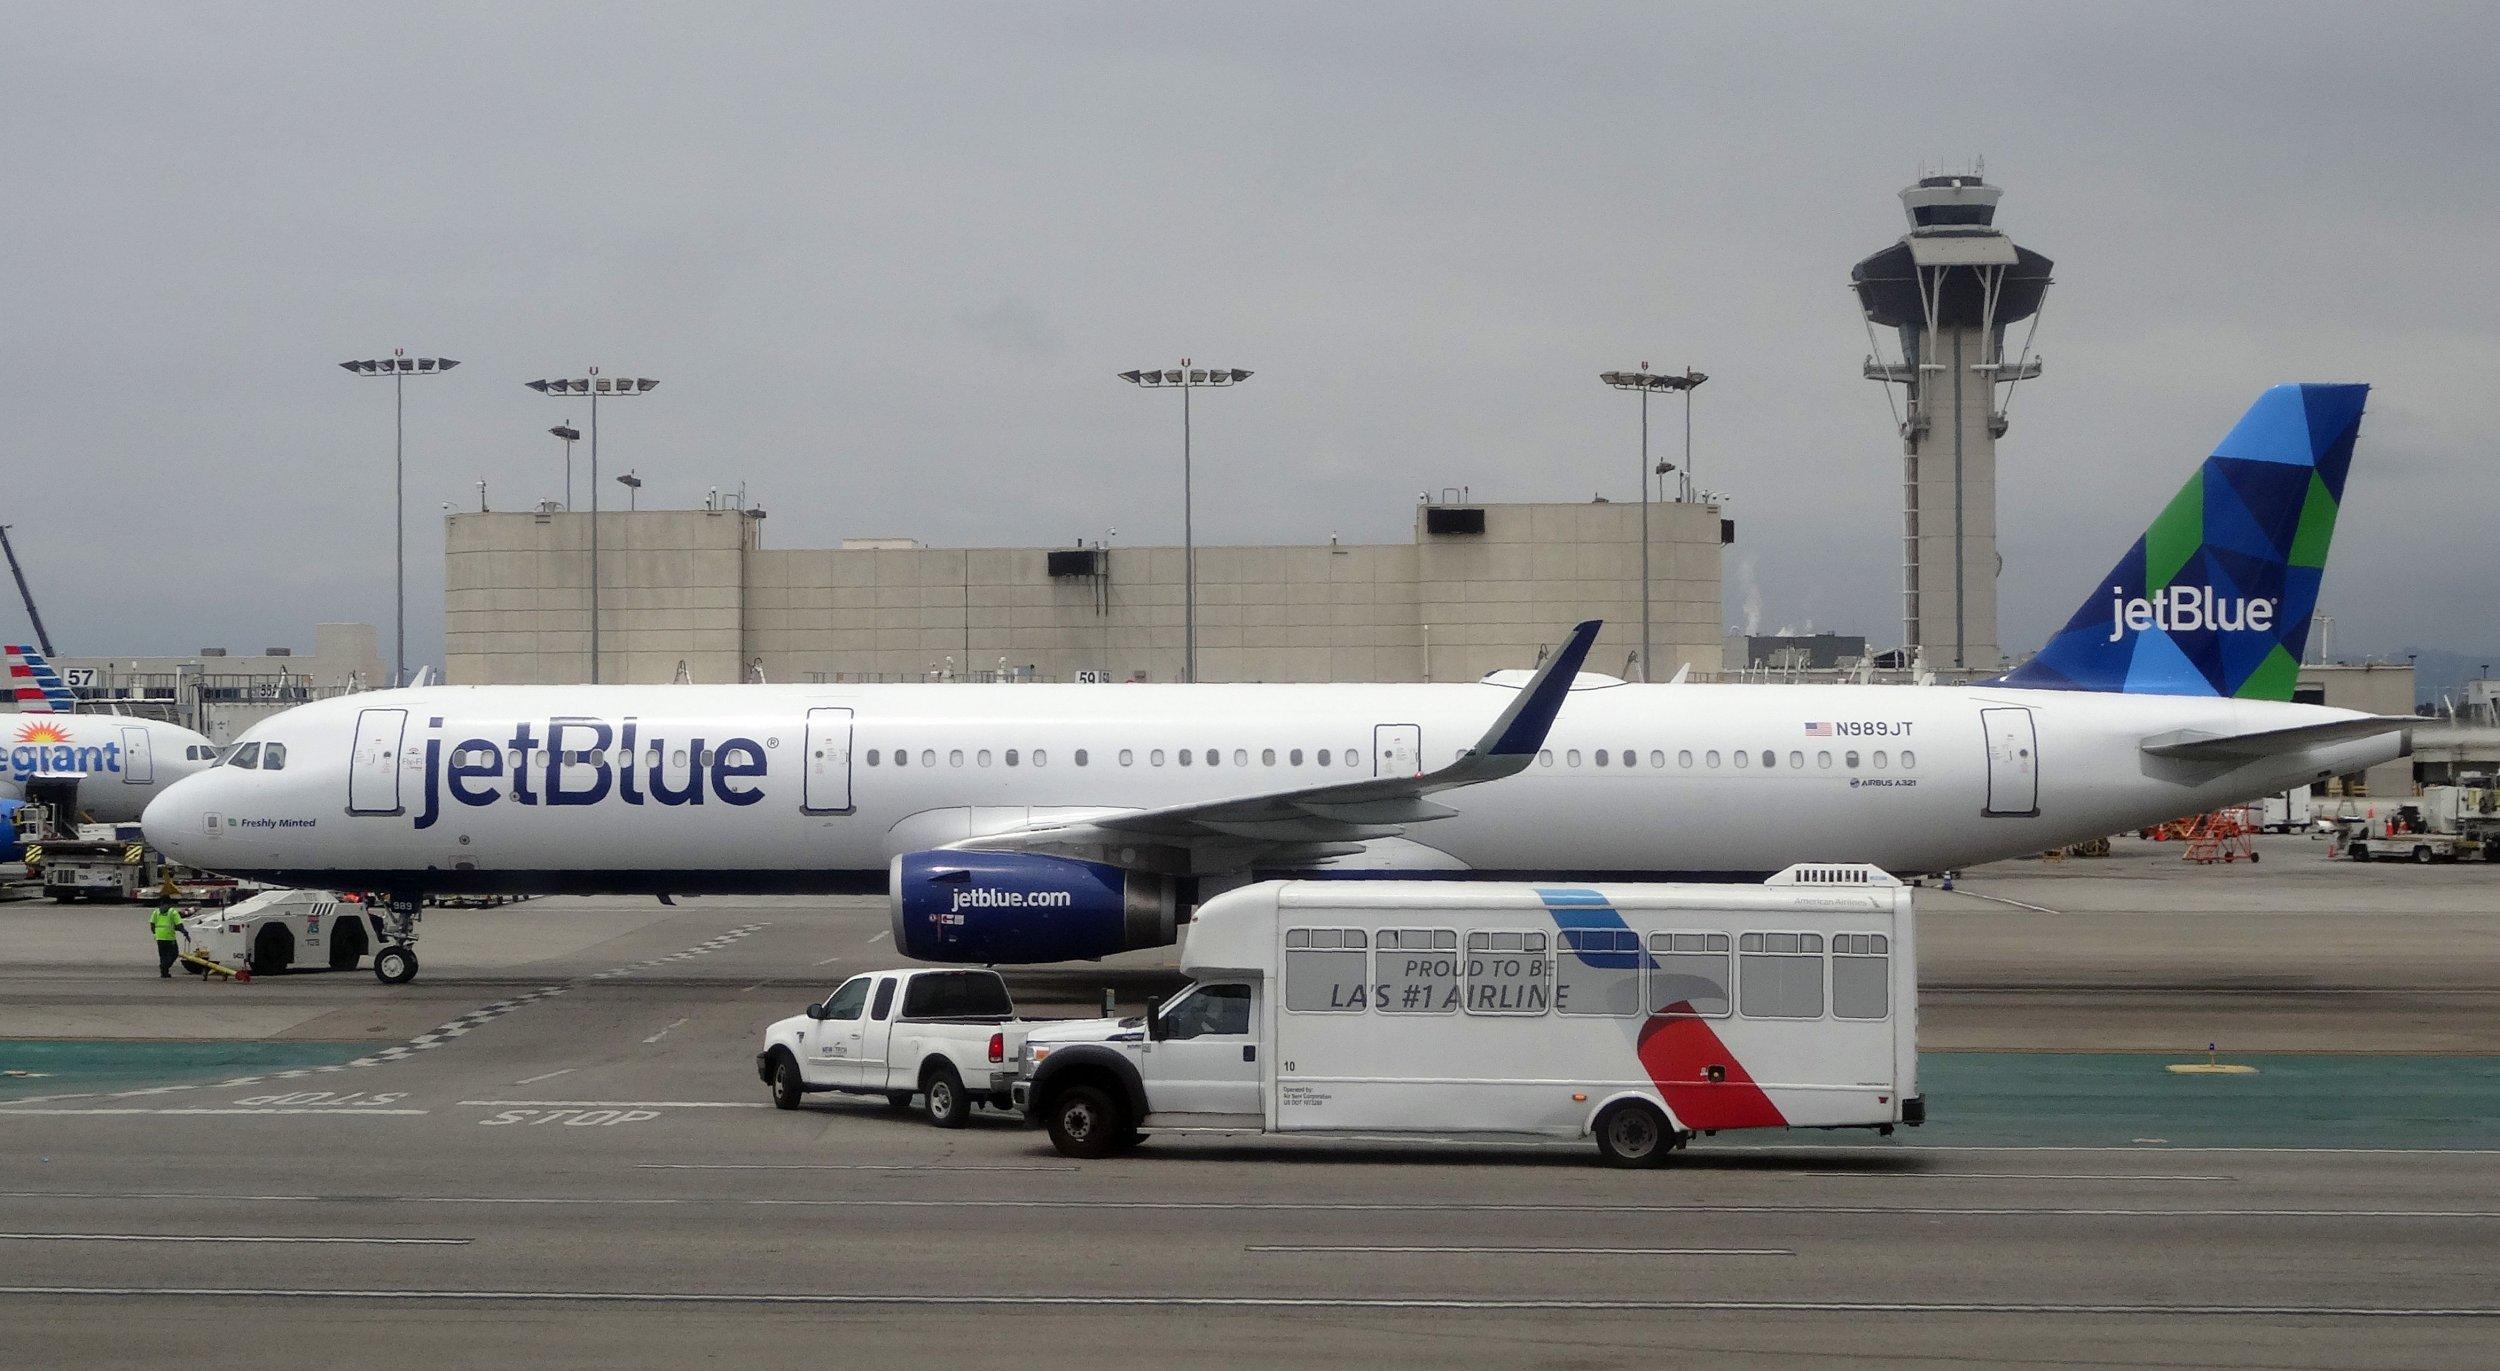 Lightning, Plane, JetBlue, Airplane, Emergency Landing, Overweight